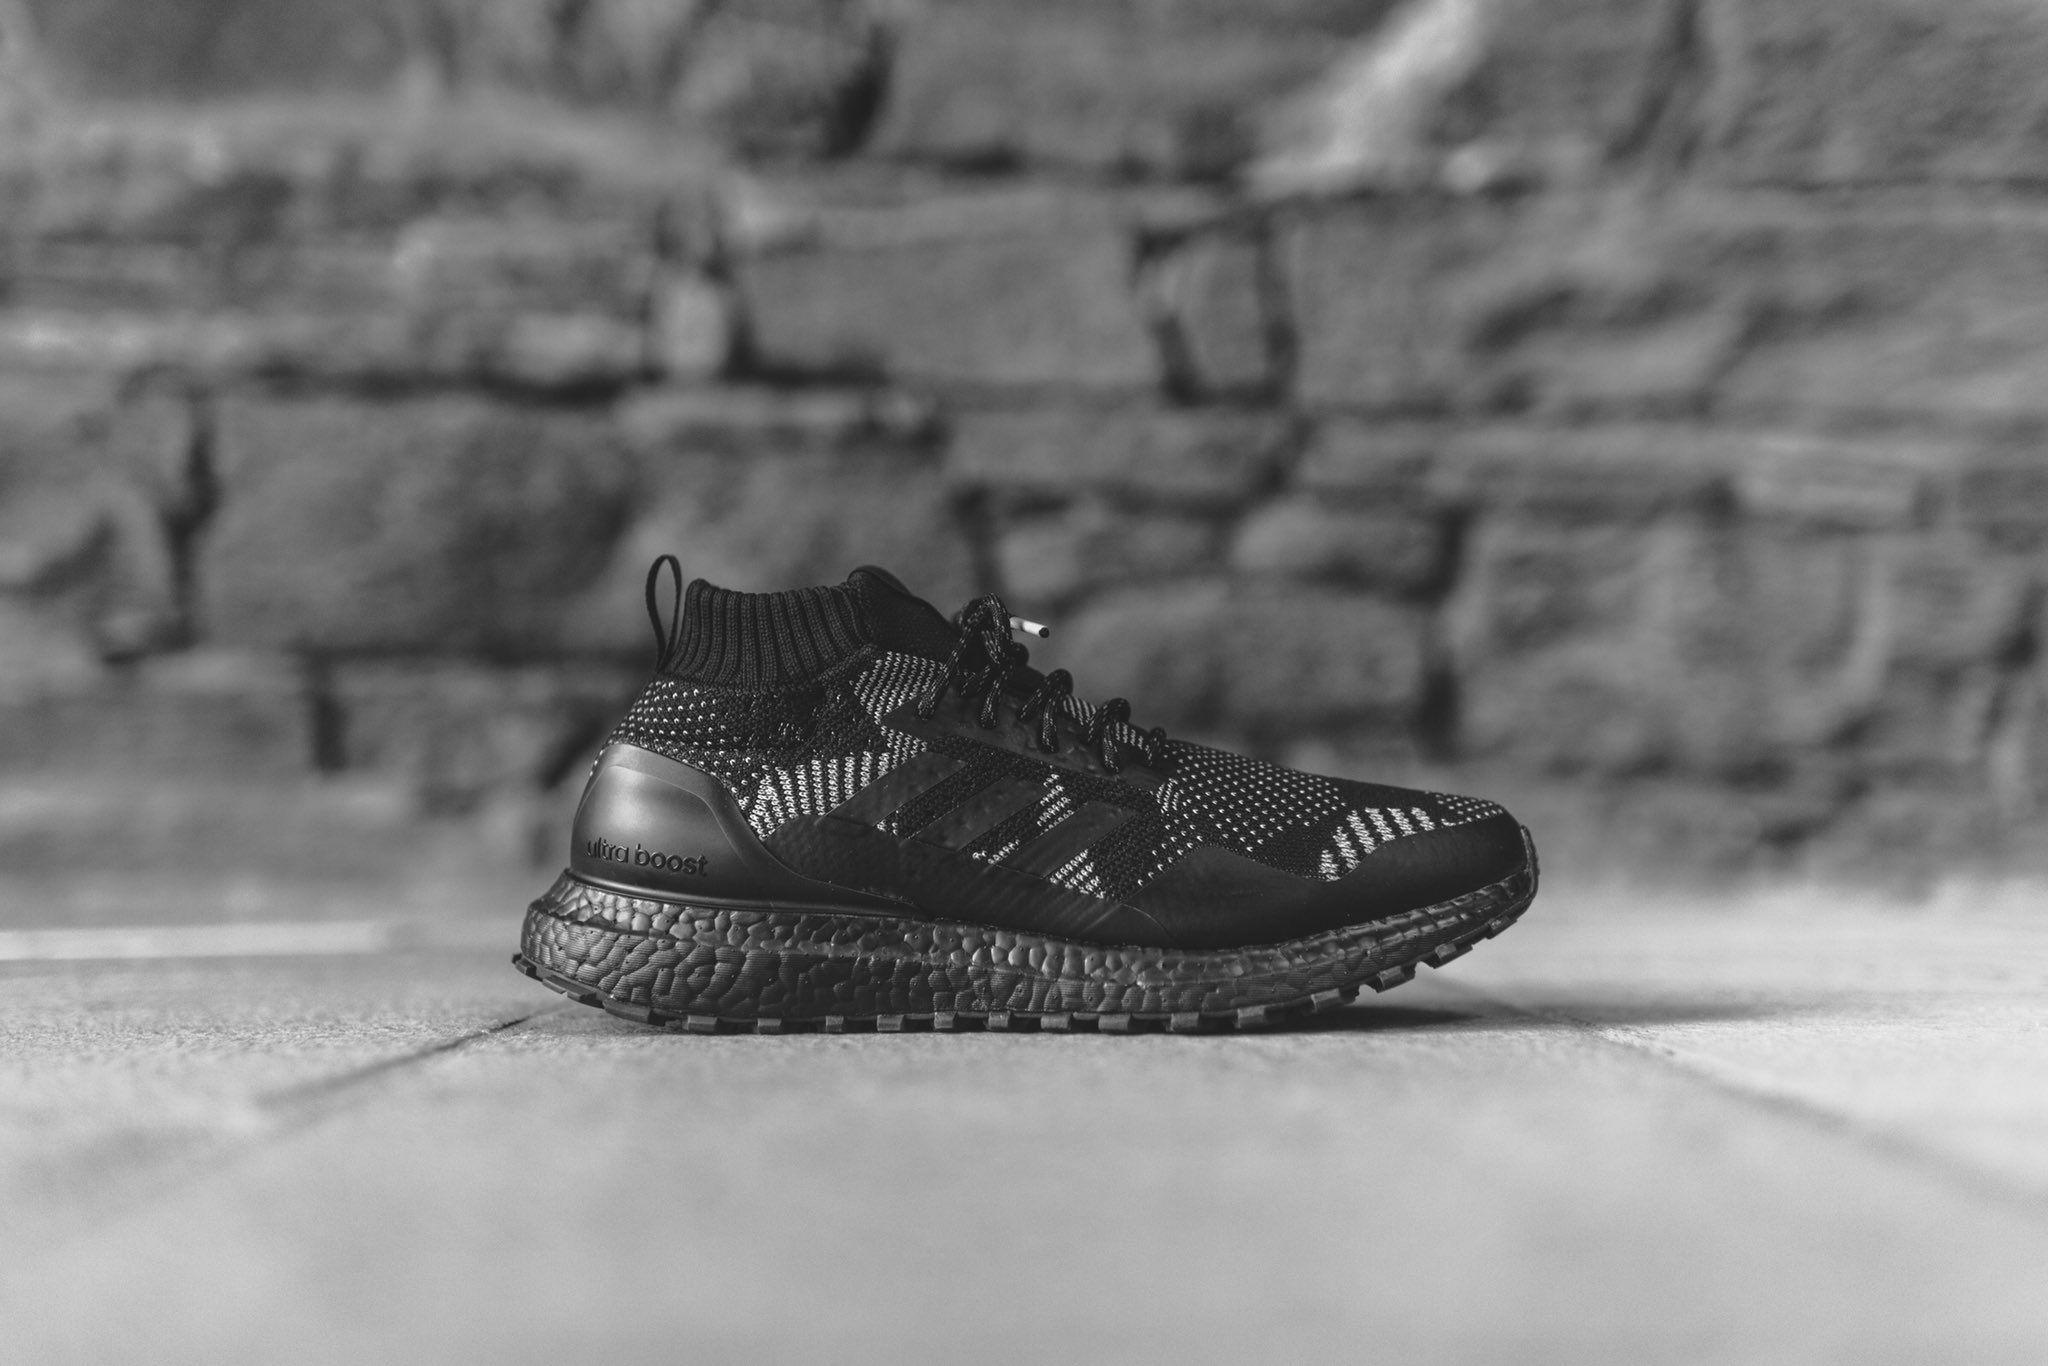 Kith X Nonnative X Adidas Ultra Boost atr mid on feet